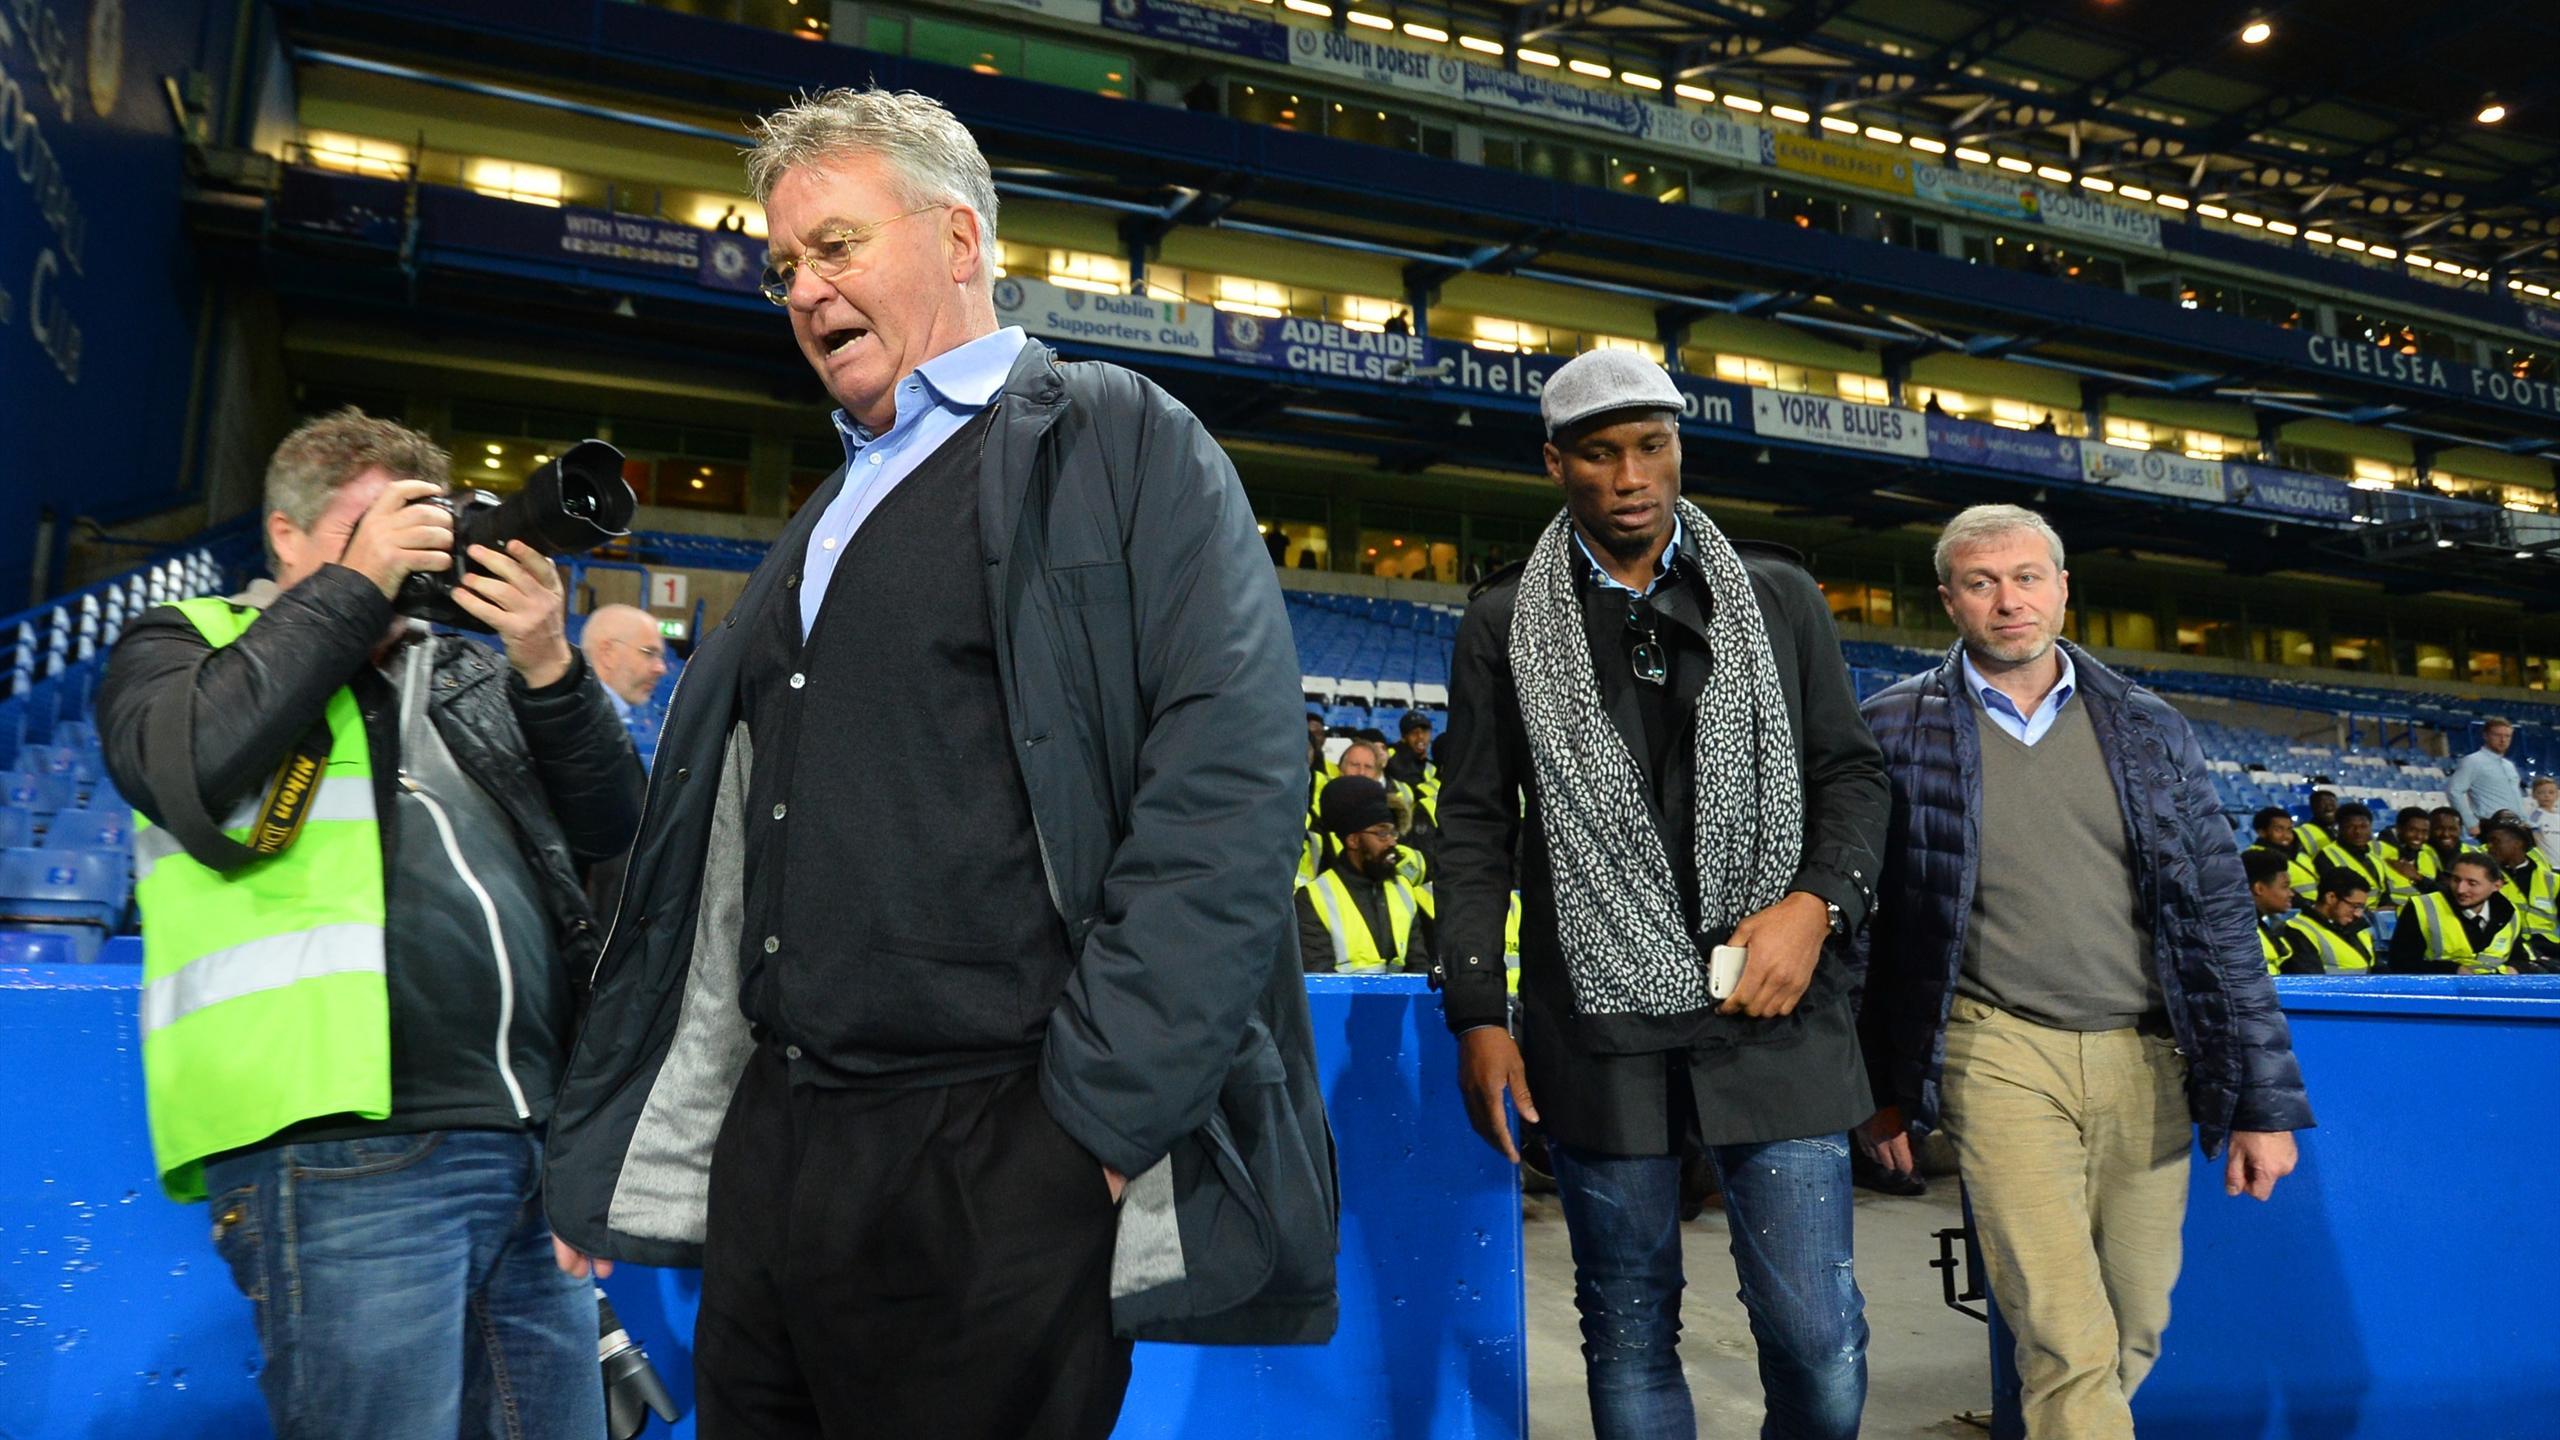 Guus Hiddink, Didier Drogba and Roman Abramovich at Stamford Bridge